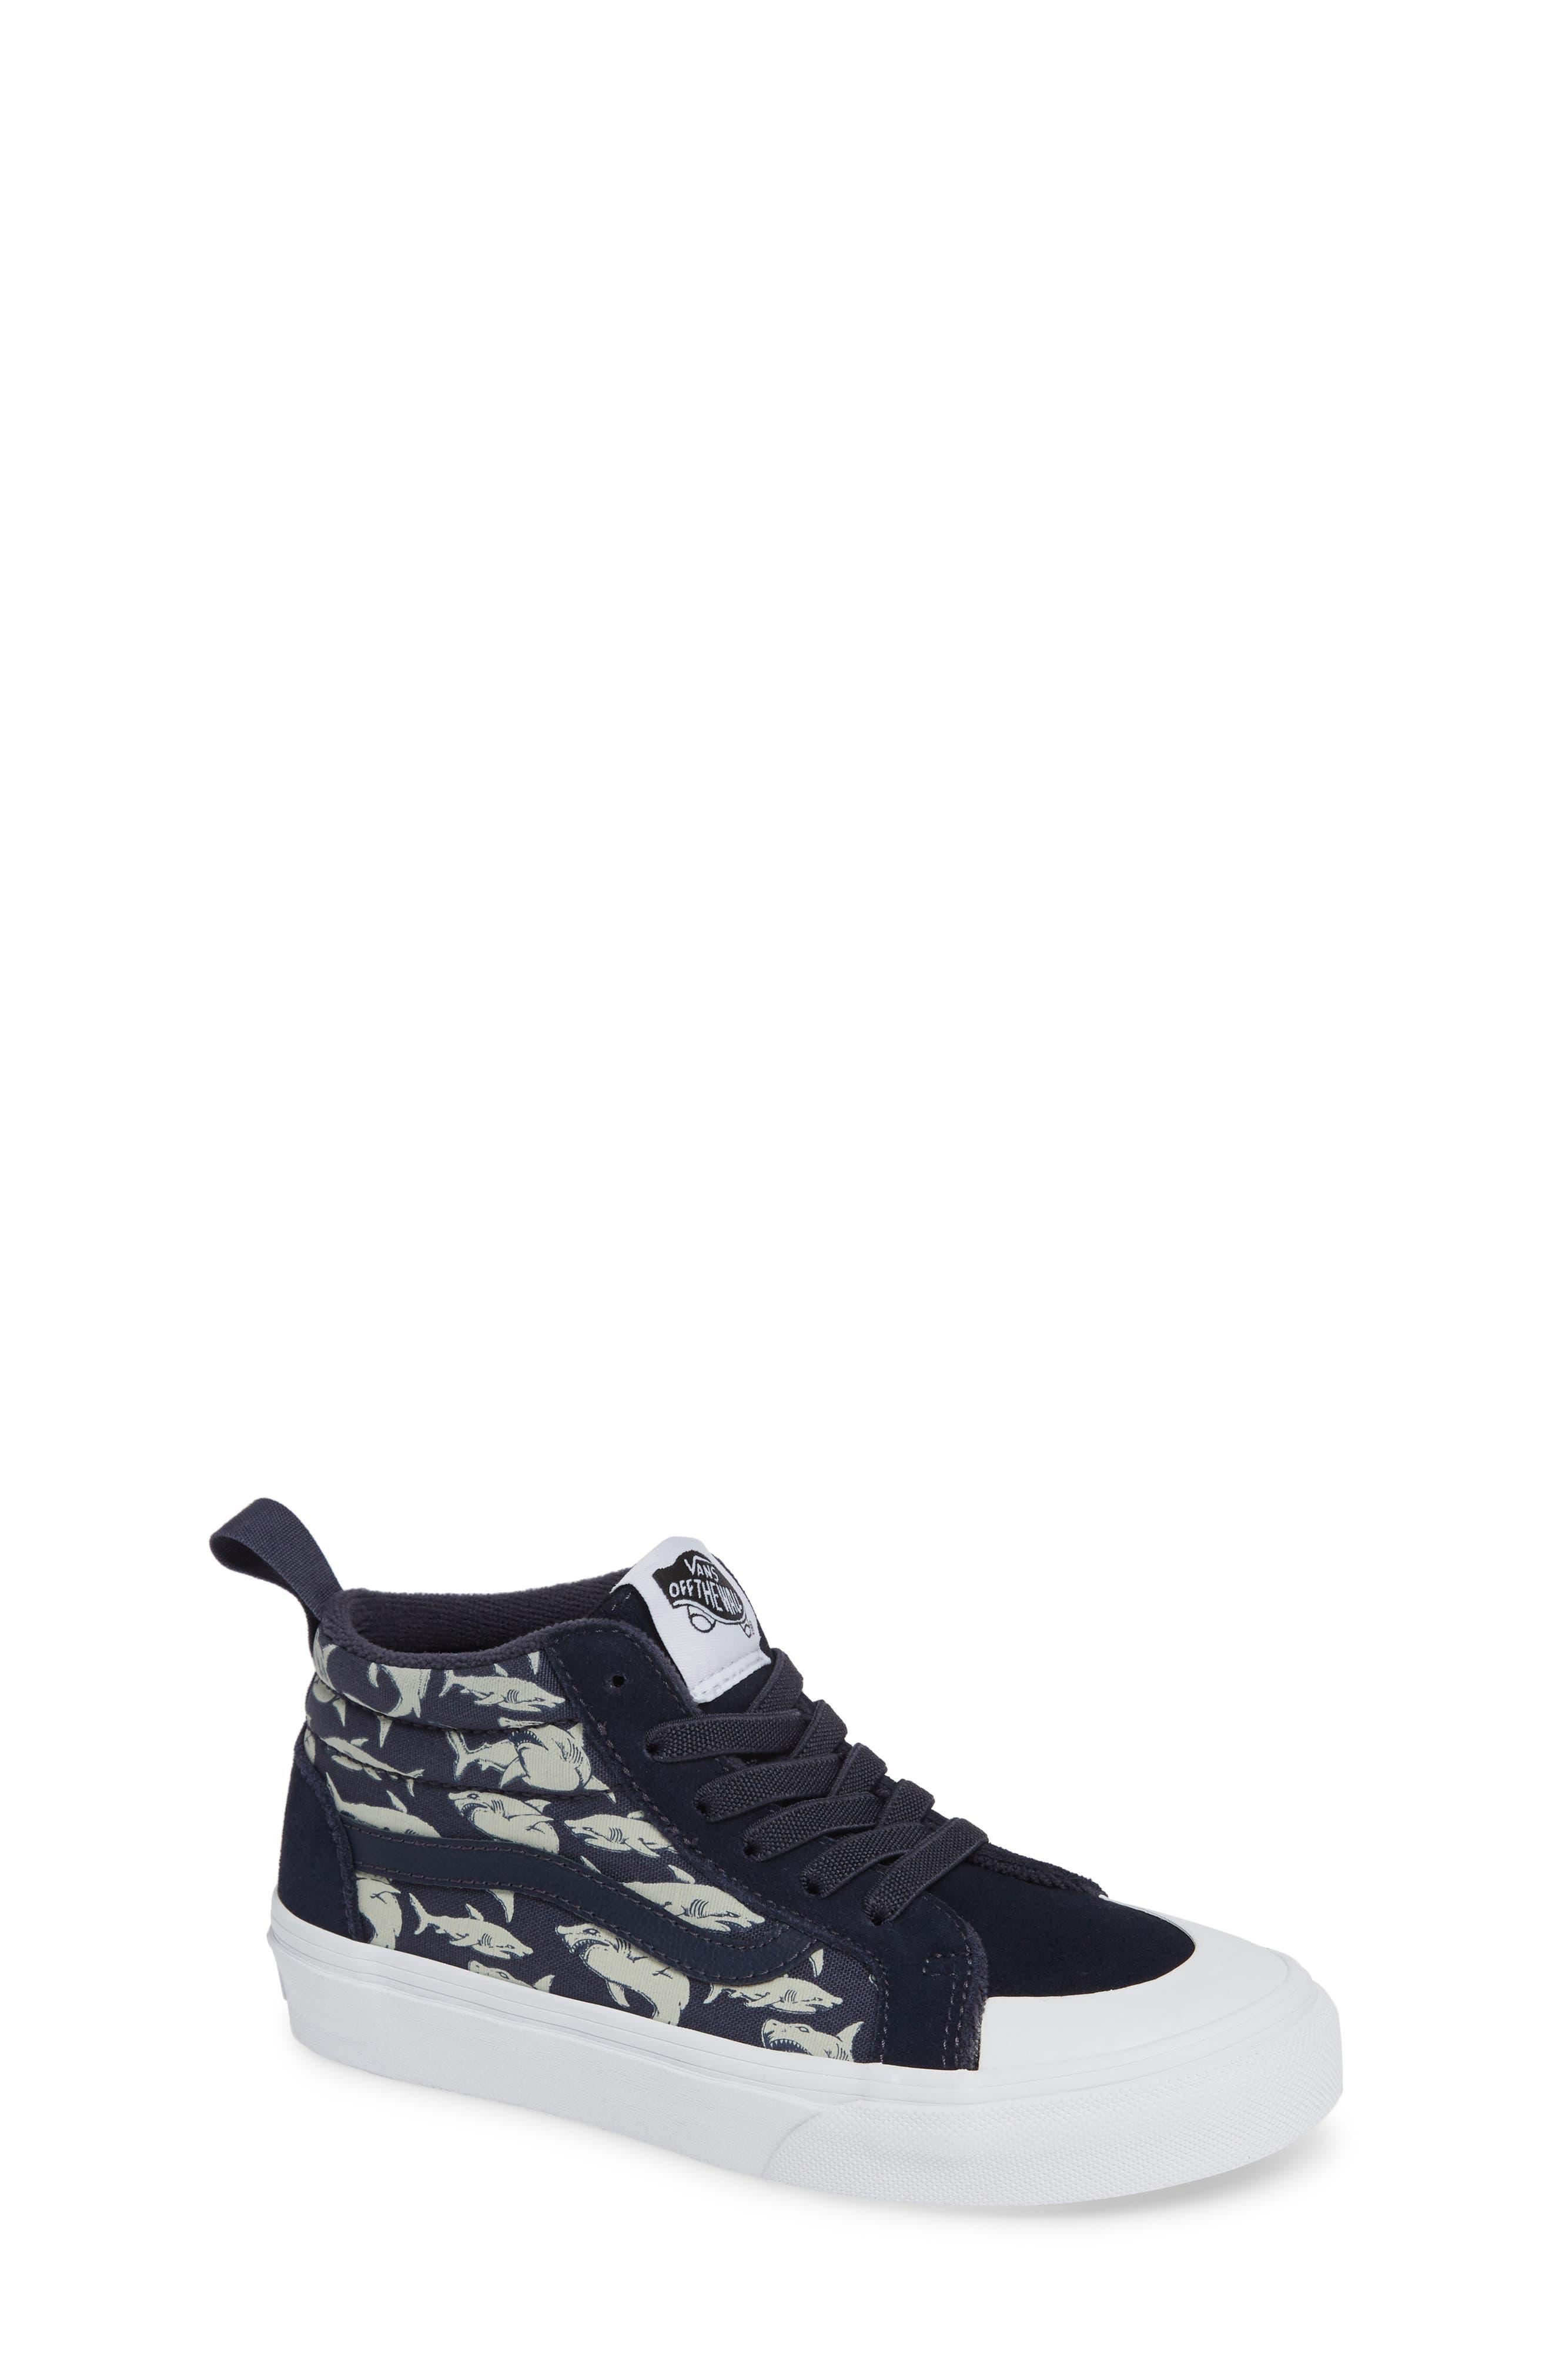 Toddler Boys Vans Racer Mid Elastic Lace Sneaker Size 11 M  Blue